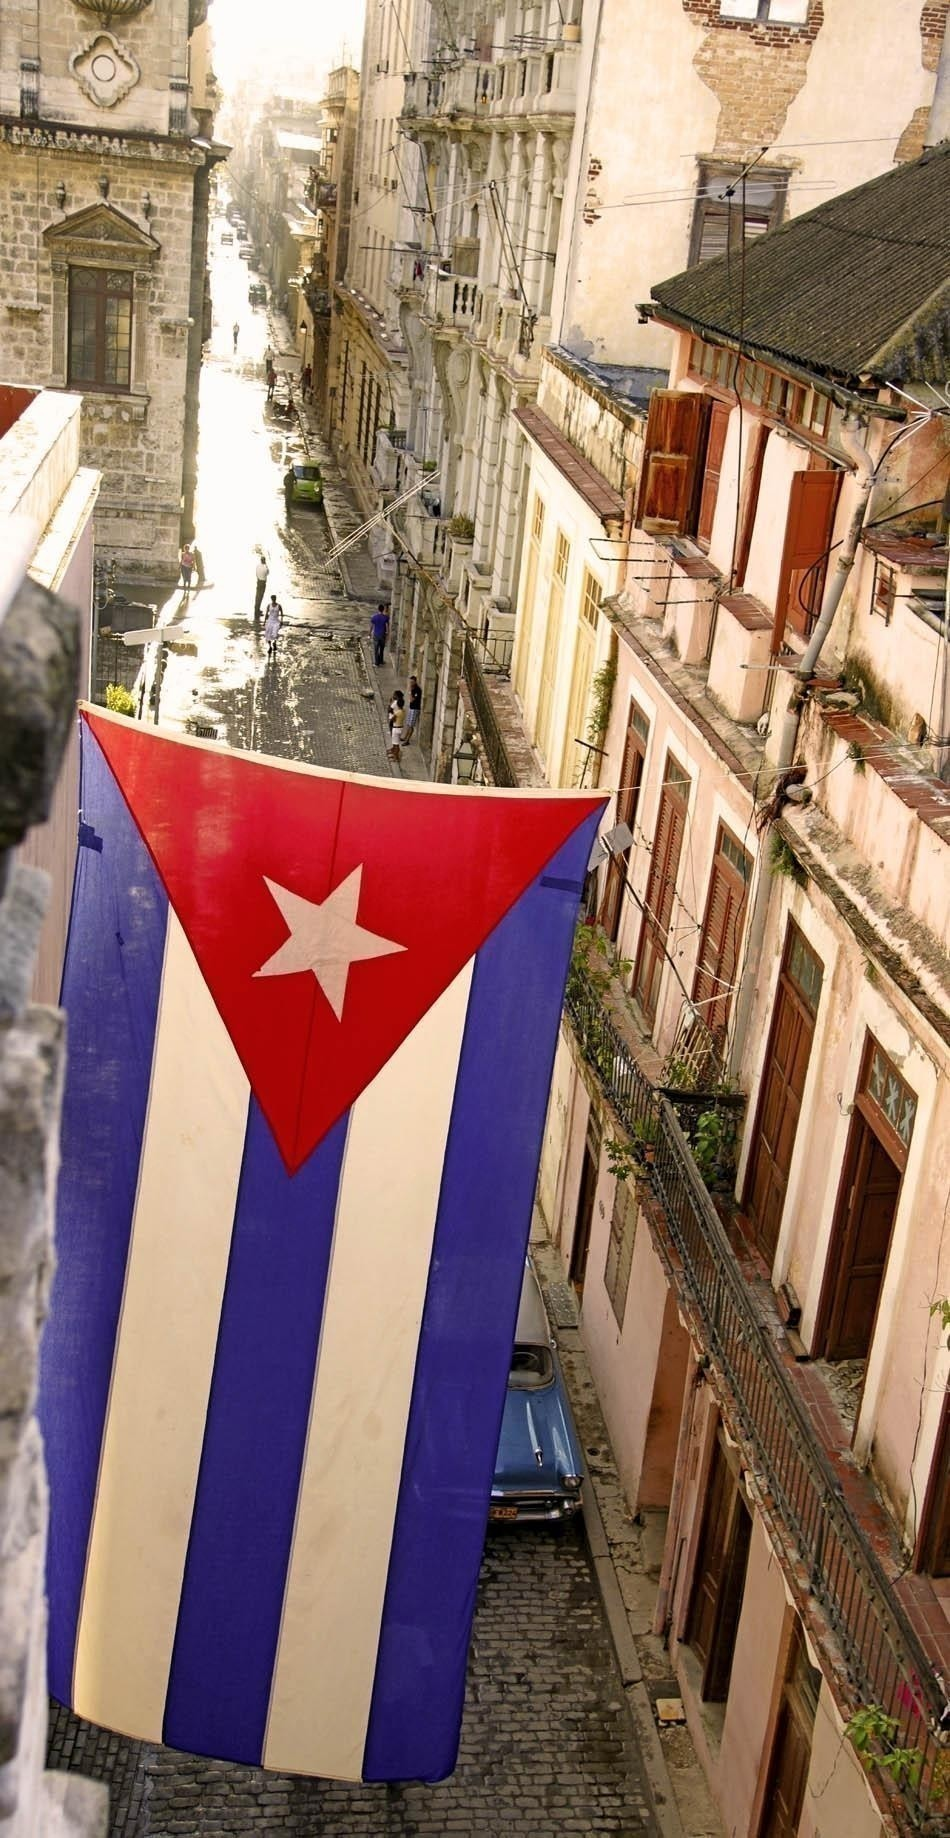 The colonial treasures of old Havana   Top 10 Reasons to Visit Cuba